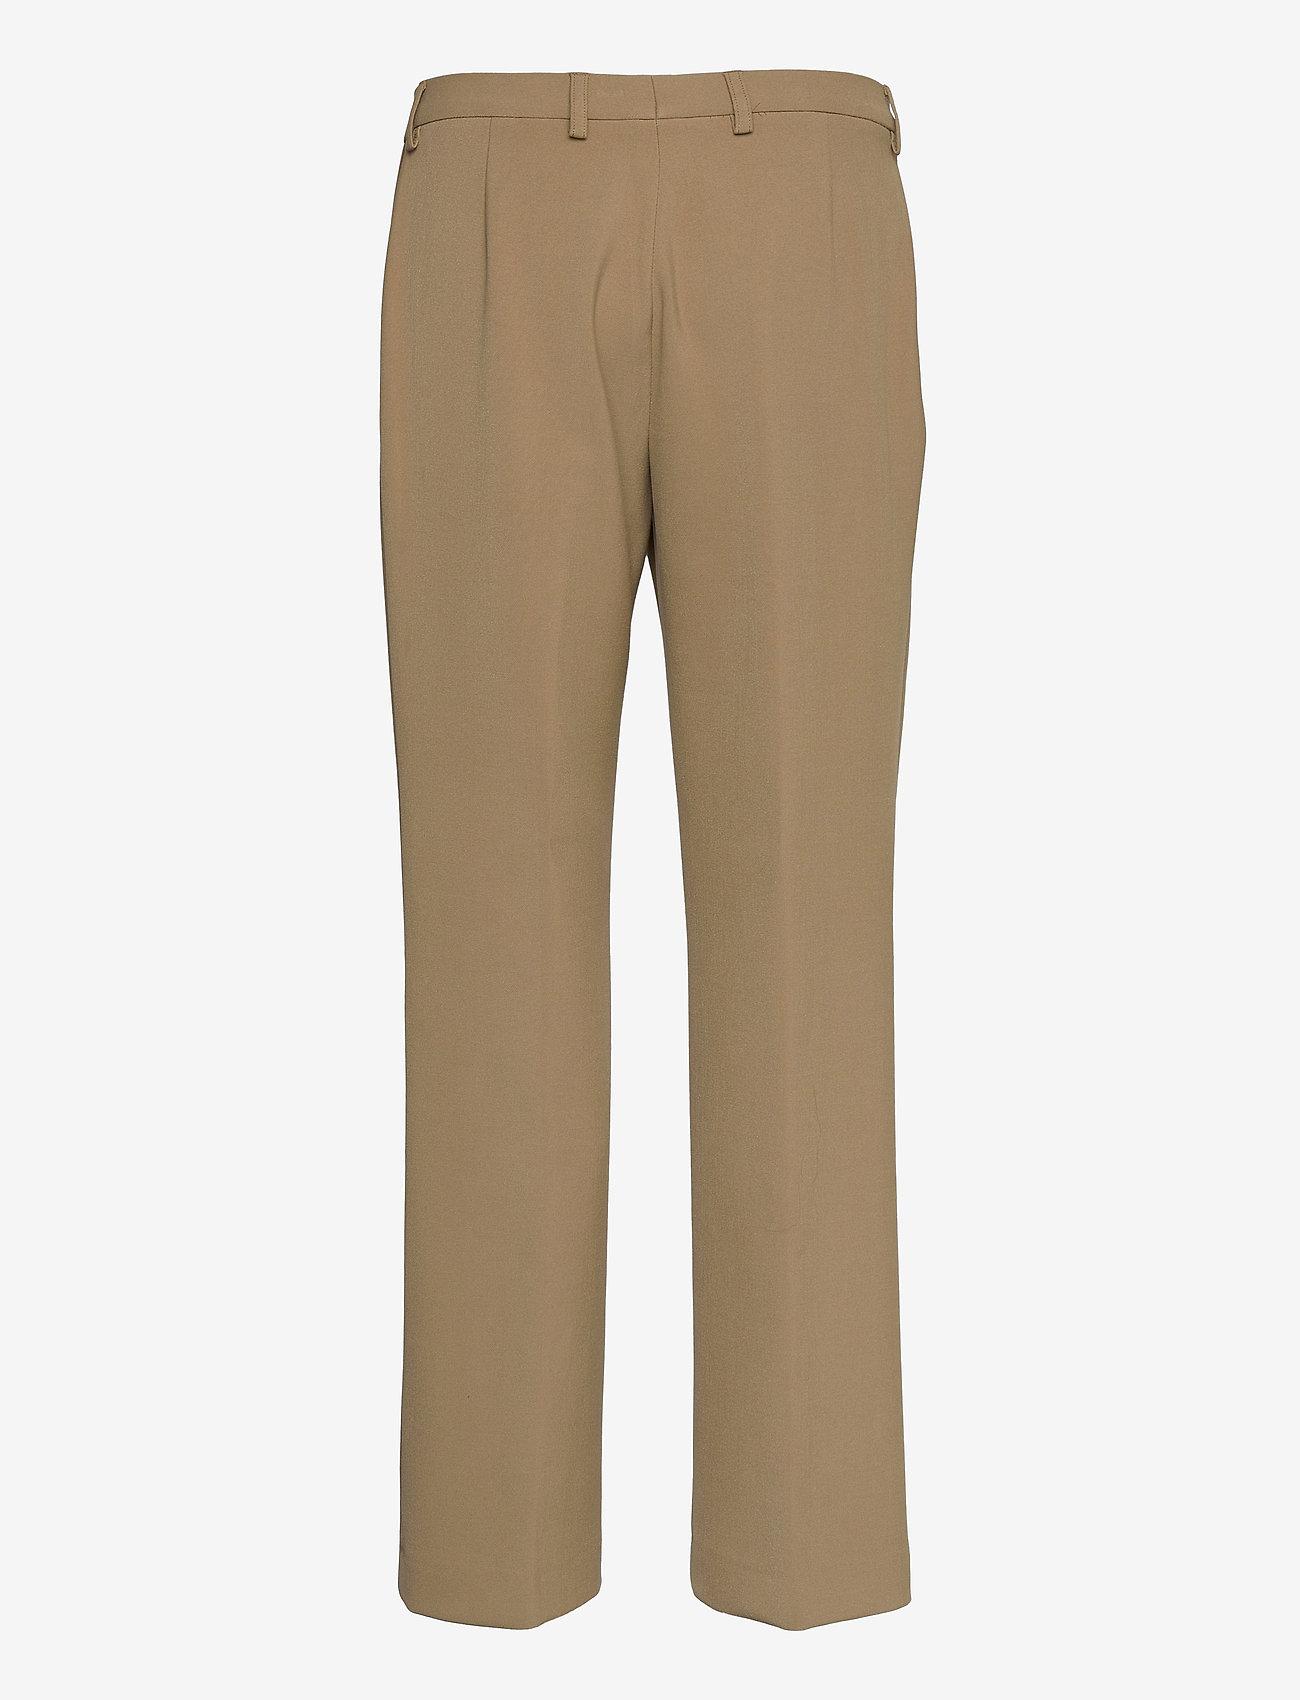 SAND - 3596 - Sasha Tailored - broeken med straight ben - light camel - 1